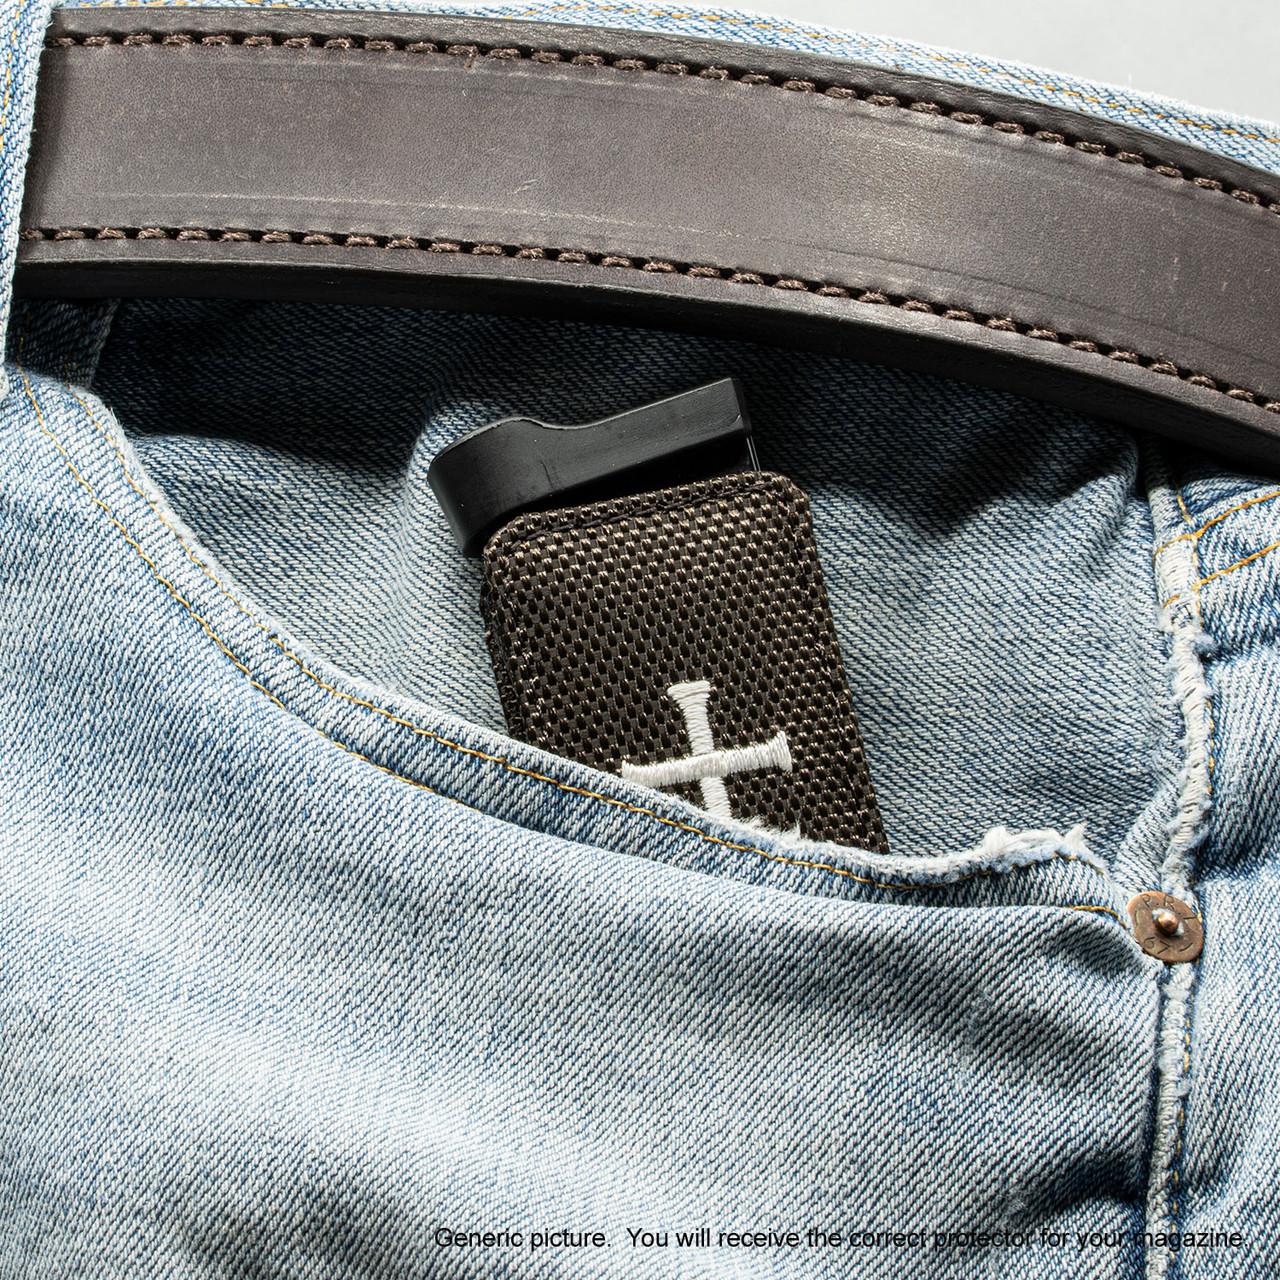 CZ 75D Compact Brown Cross Magazine Pocket Protector